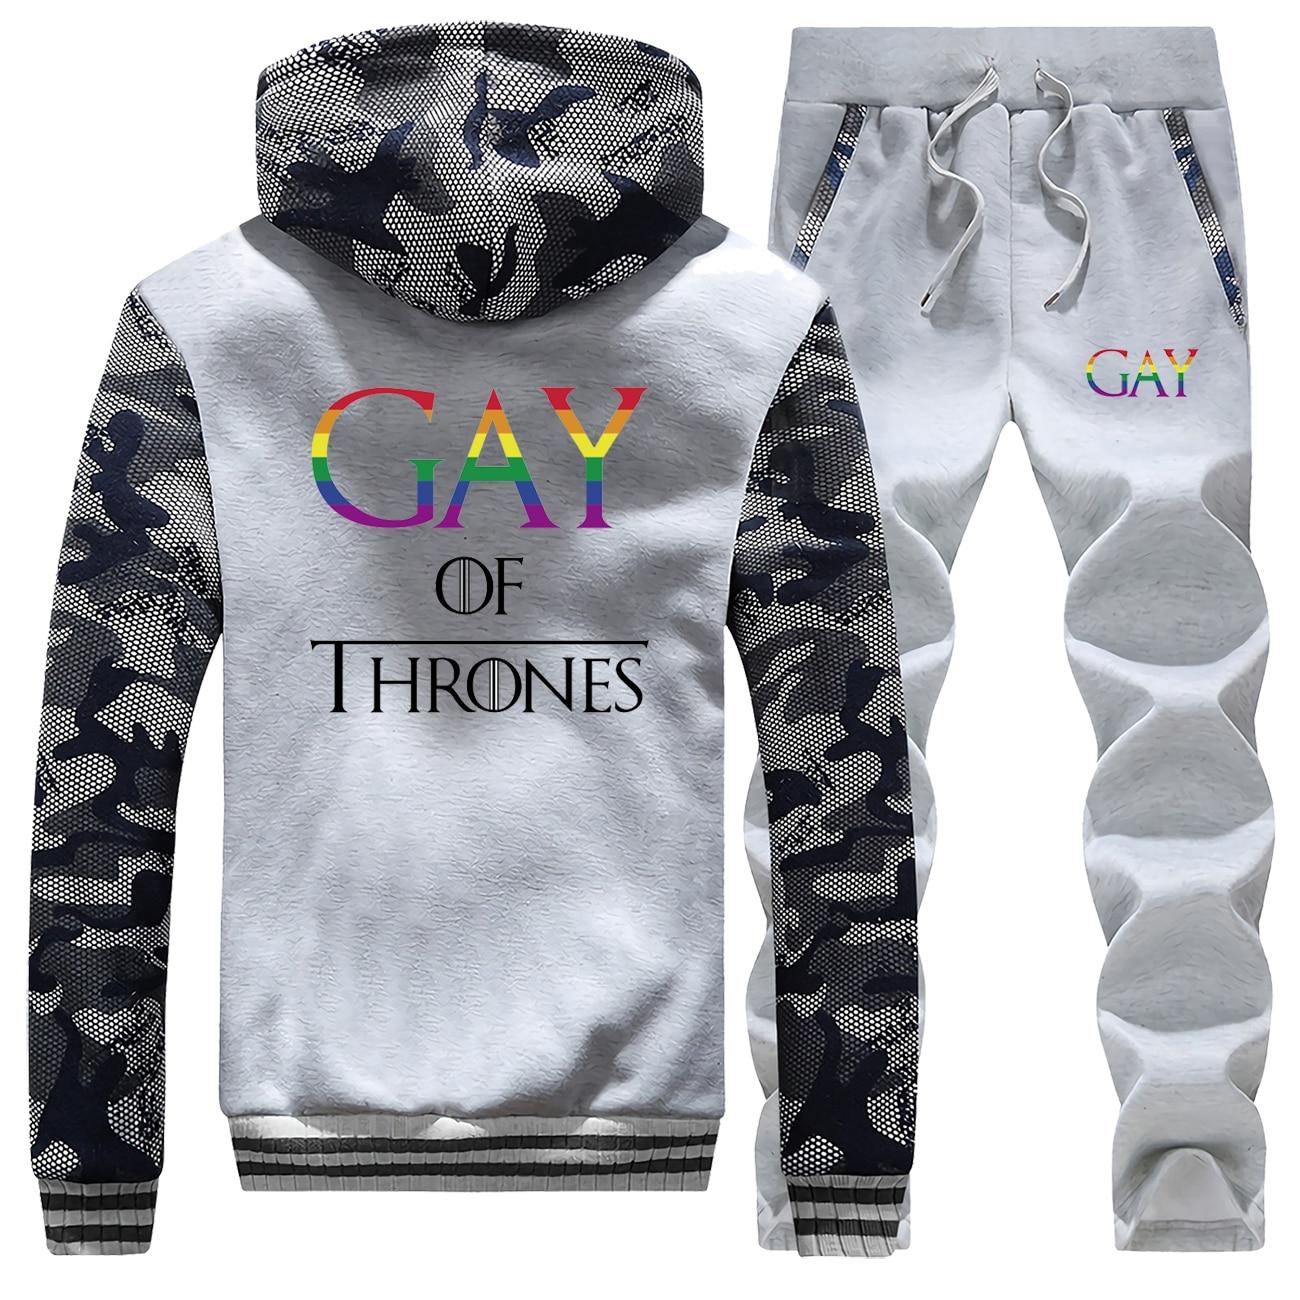 2019 Winter Men Hoodies Gay Of Thrones Gay Pride Vintage Mens Camouflage Fleece Warm Jacket Suit Coat Thick+Pants 2 Piece Set